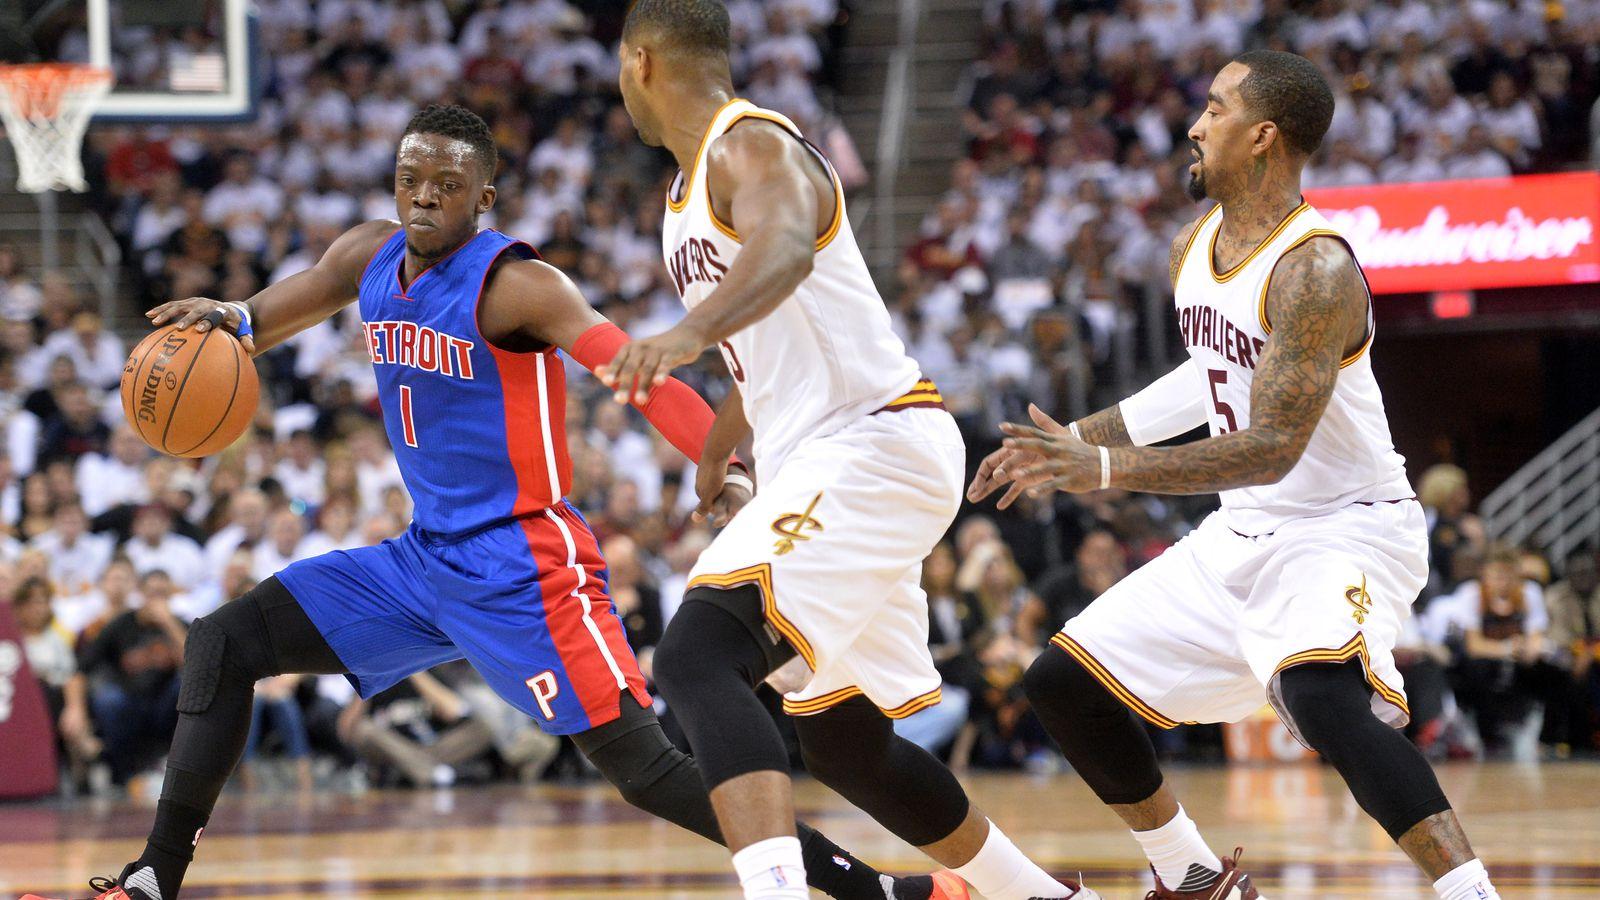 🎥 Prancheta Bola Presa – A armadilha que defende o pick-and-roll na NBA